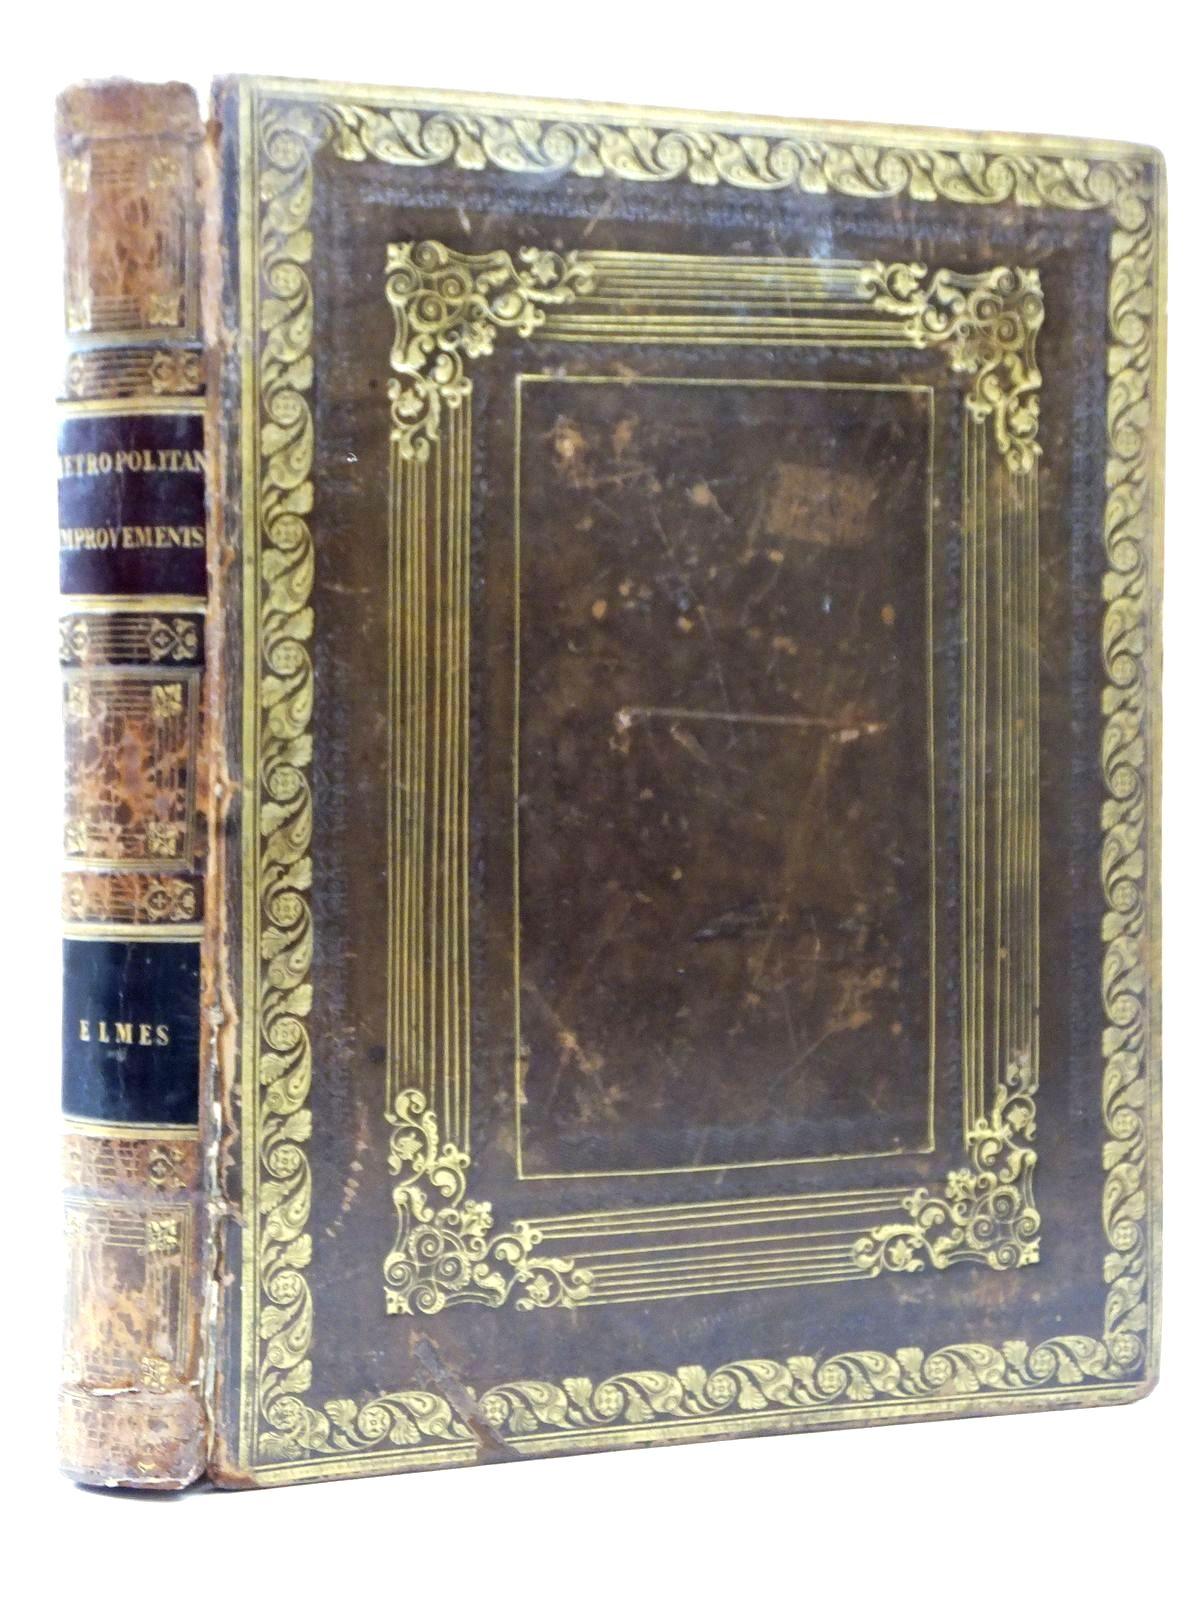 Metropolitan Improvements Or London In The Nineteenth Century Displayed In A Series Of Engravings